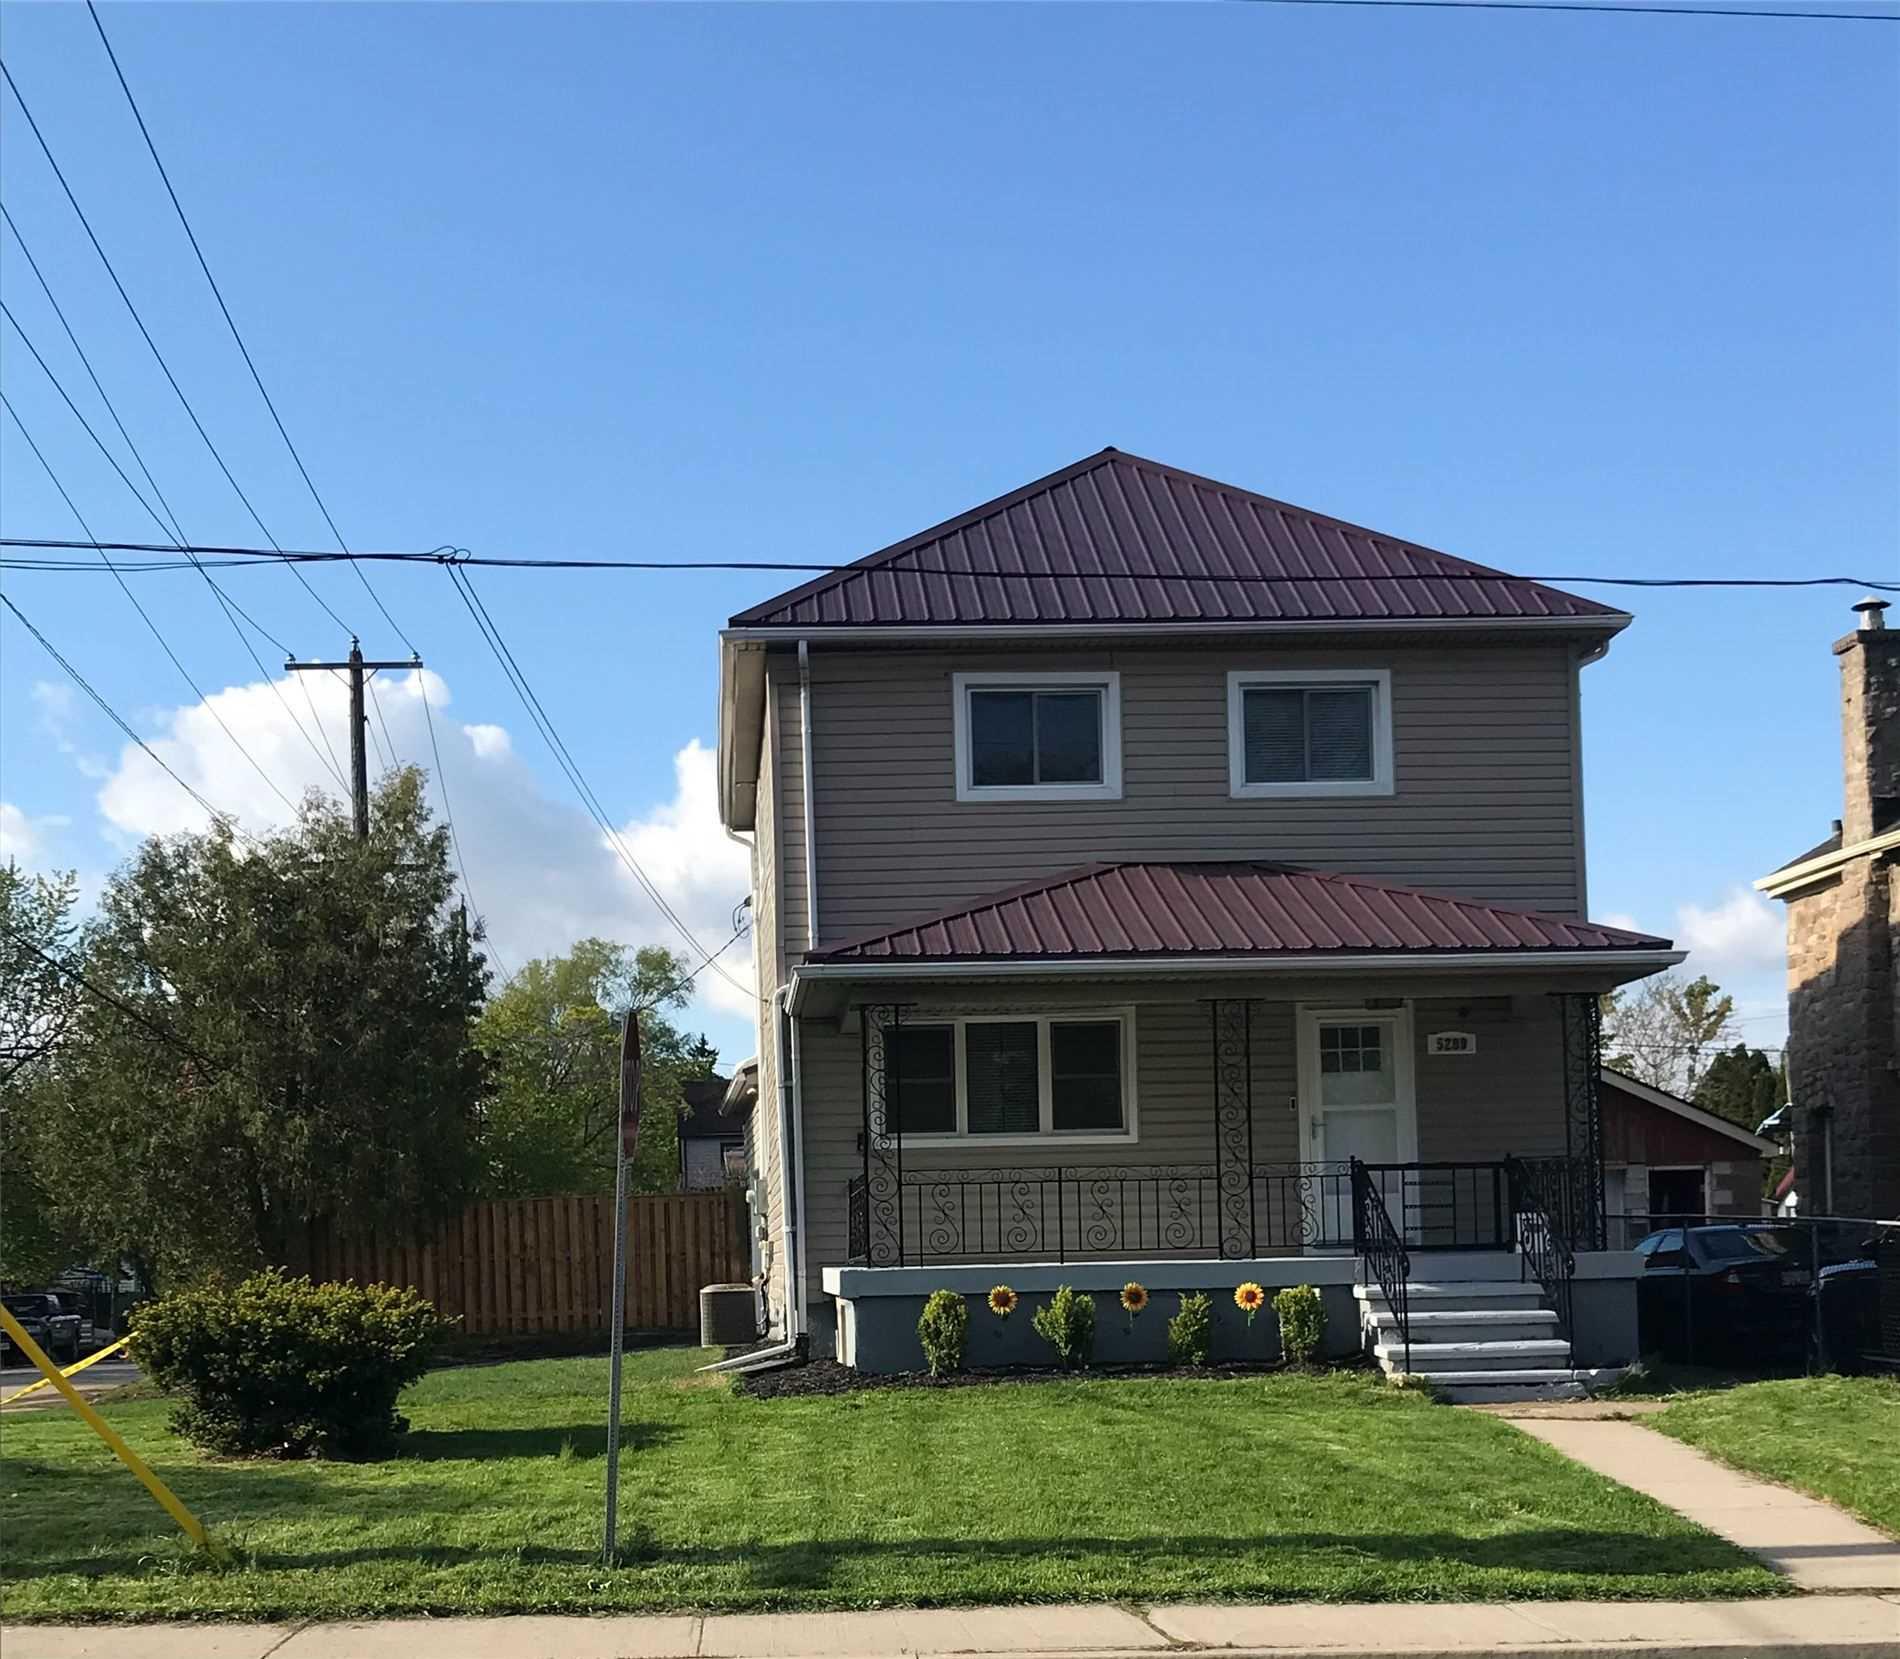 5289 Mcrae St, Niagara Falls, Ontario L2E1P9, 4 Bedrooms Bedrooms, ,3 BathroomsBathrooms,Detached,For Sale,Mcrae,X5273321